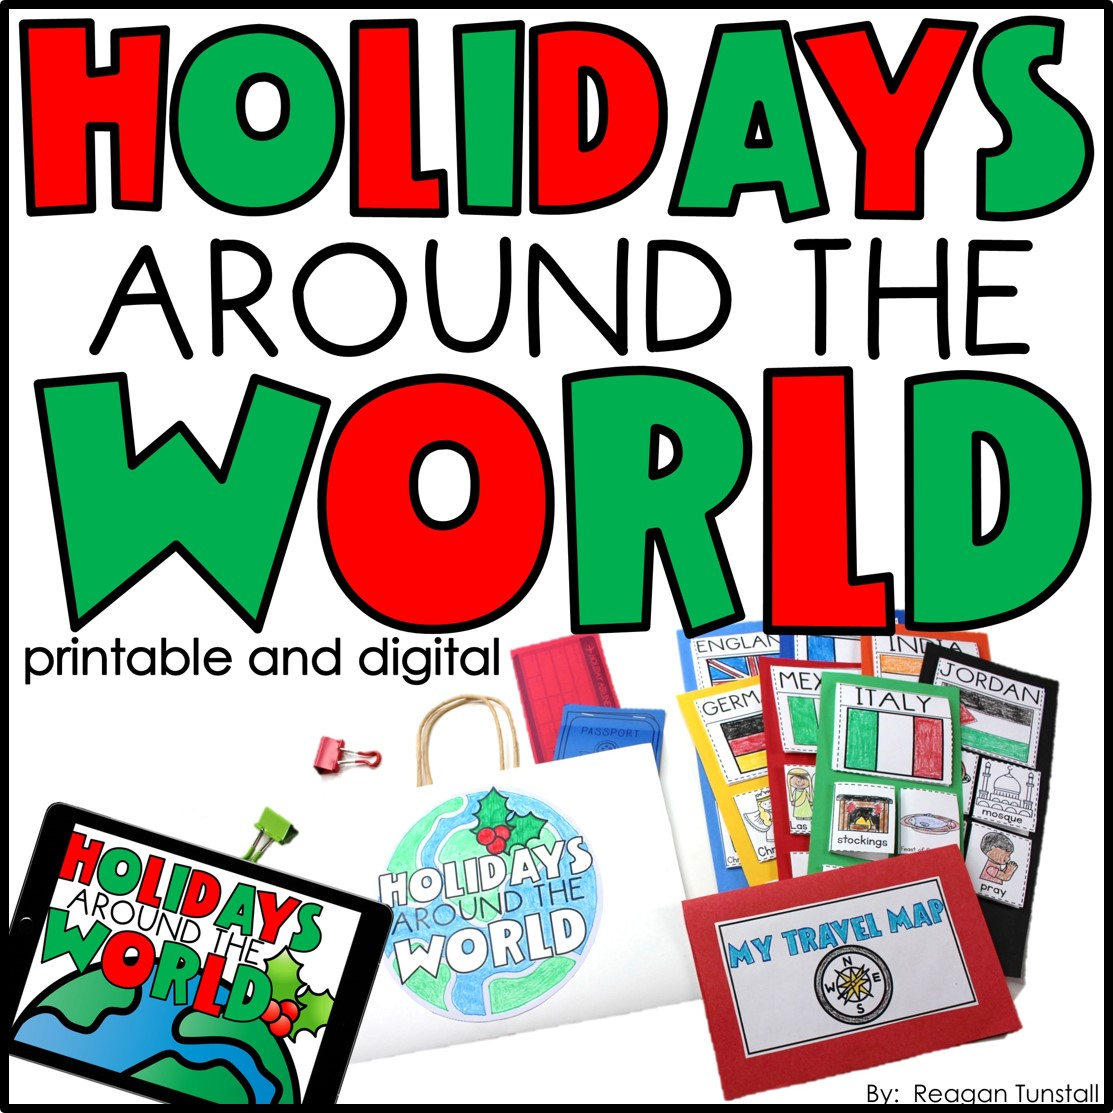 Holidays Around the World Printable and Digital